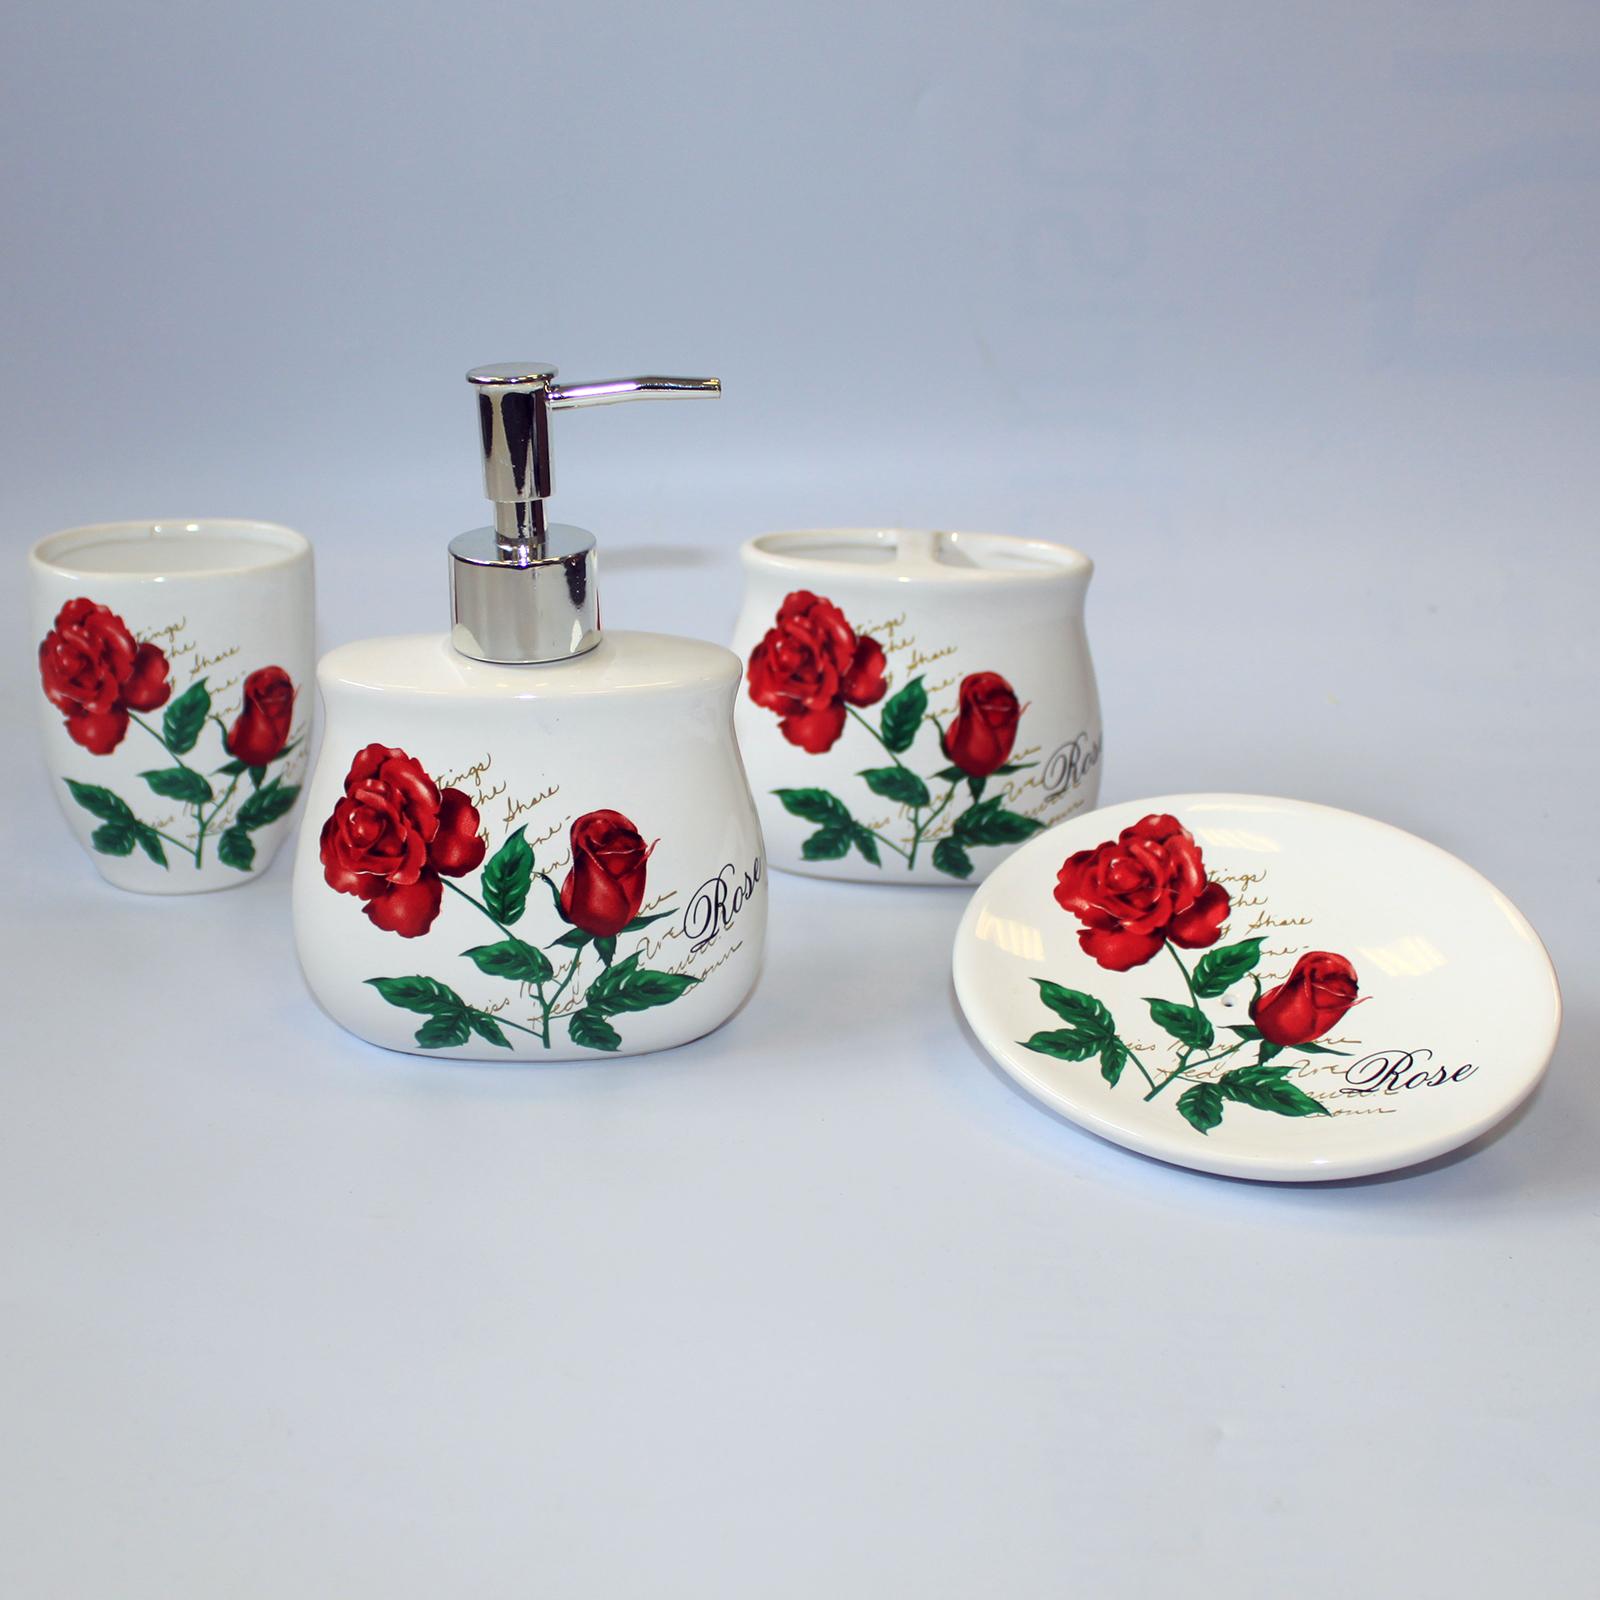 Ceramic Bath Set - Roses in Bloom